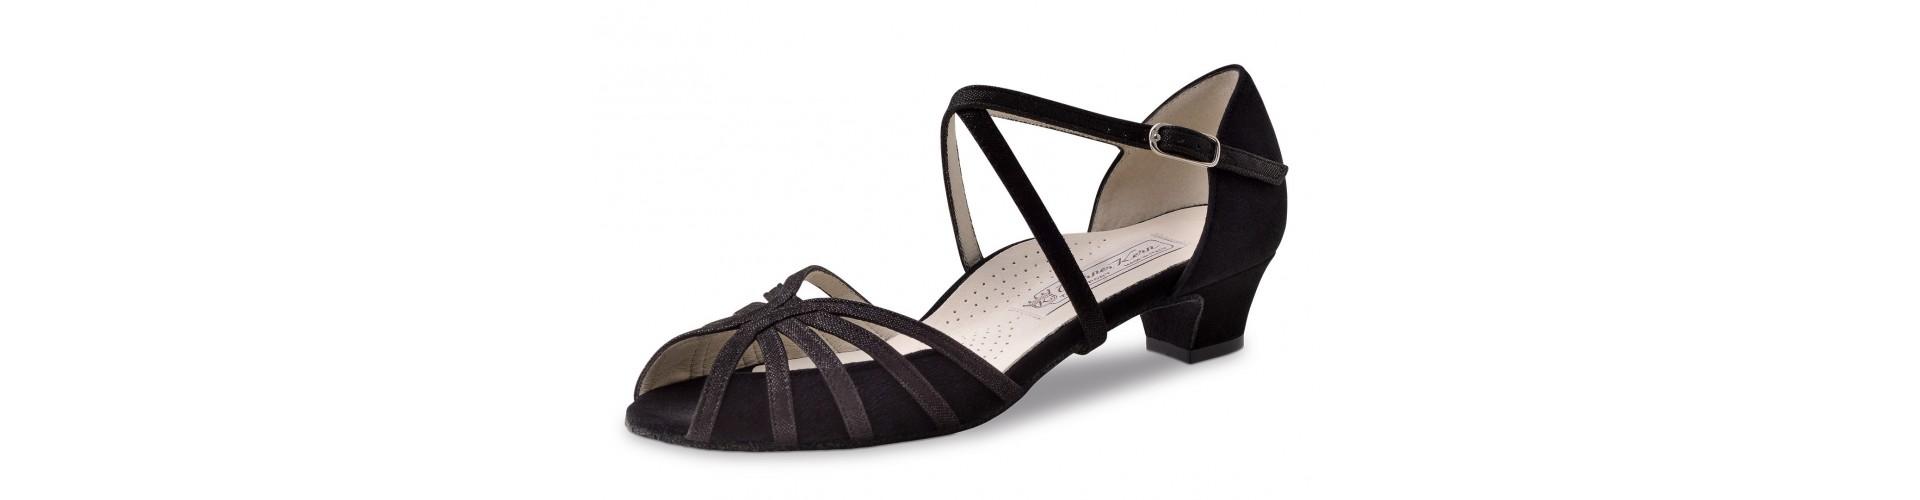 Chaussures danse de salon talon moyen à bas